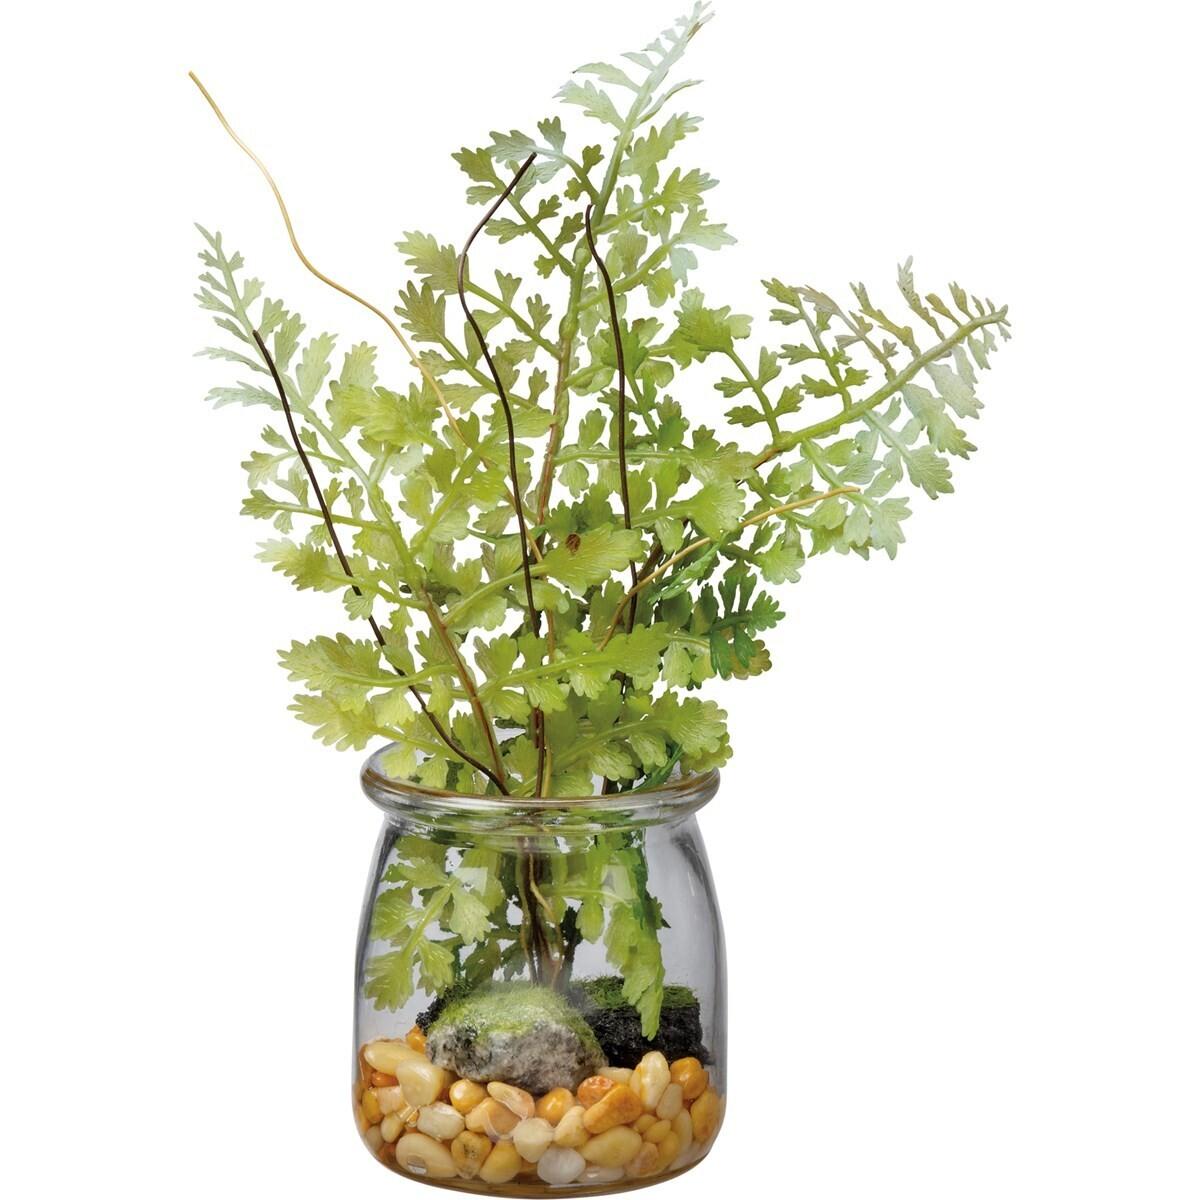 Jar - Small Maidenhair Fern